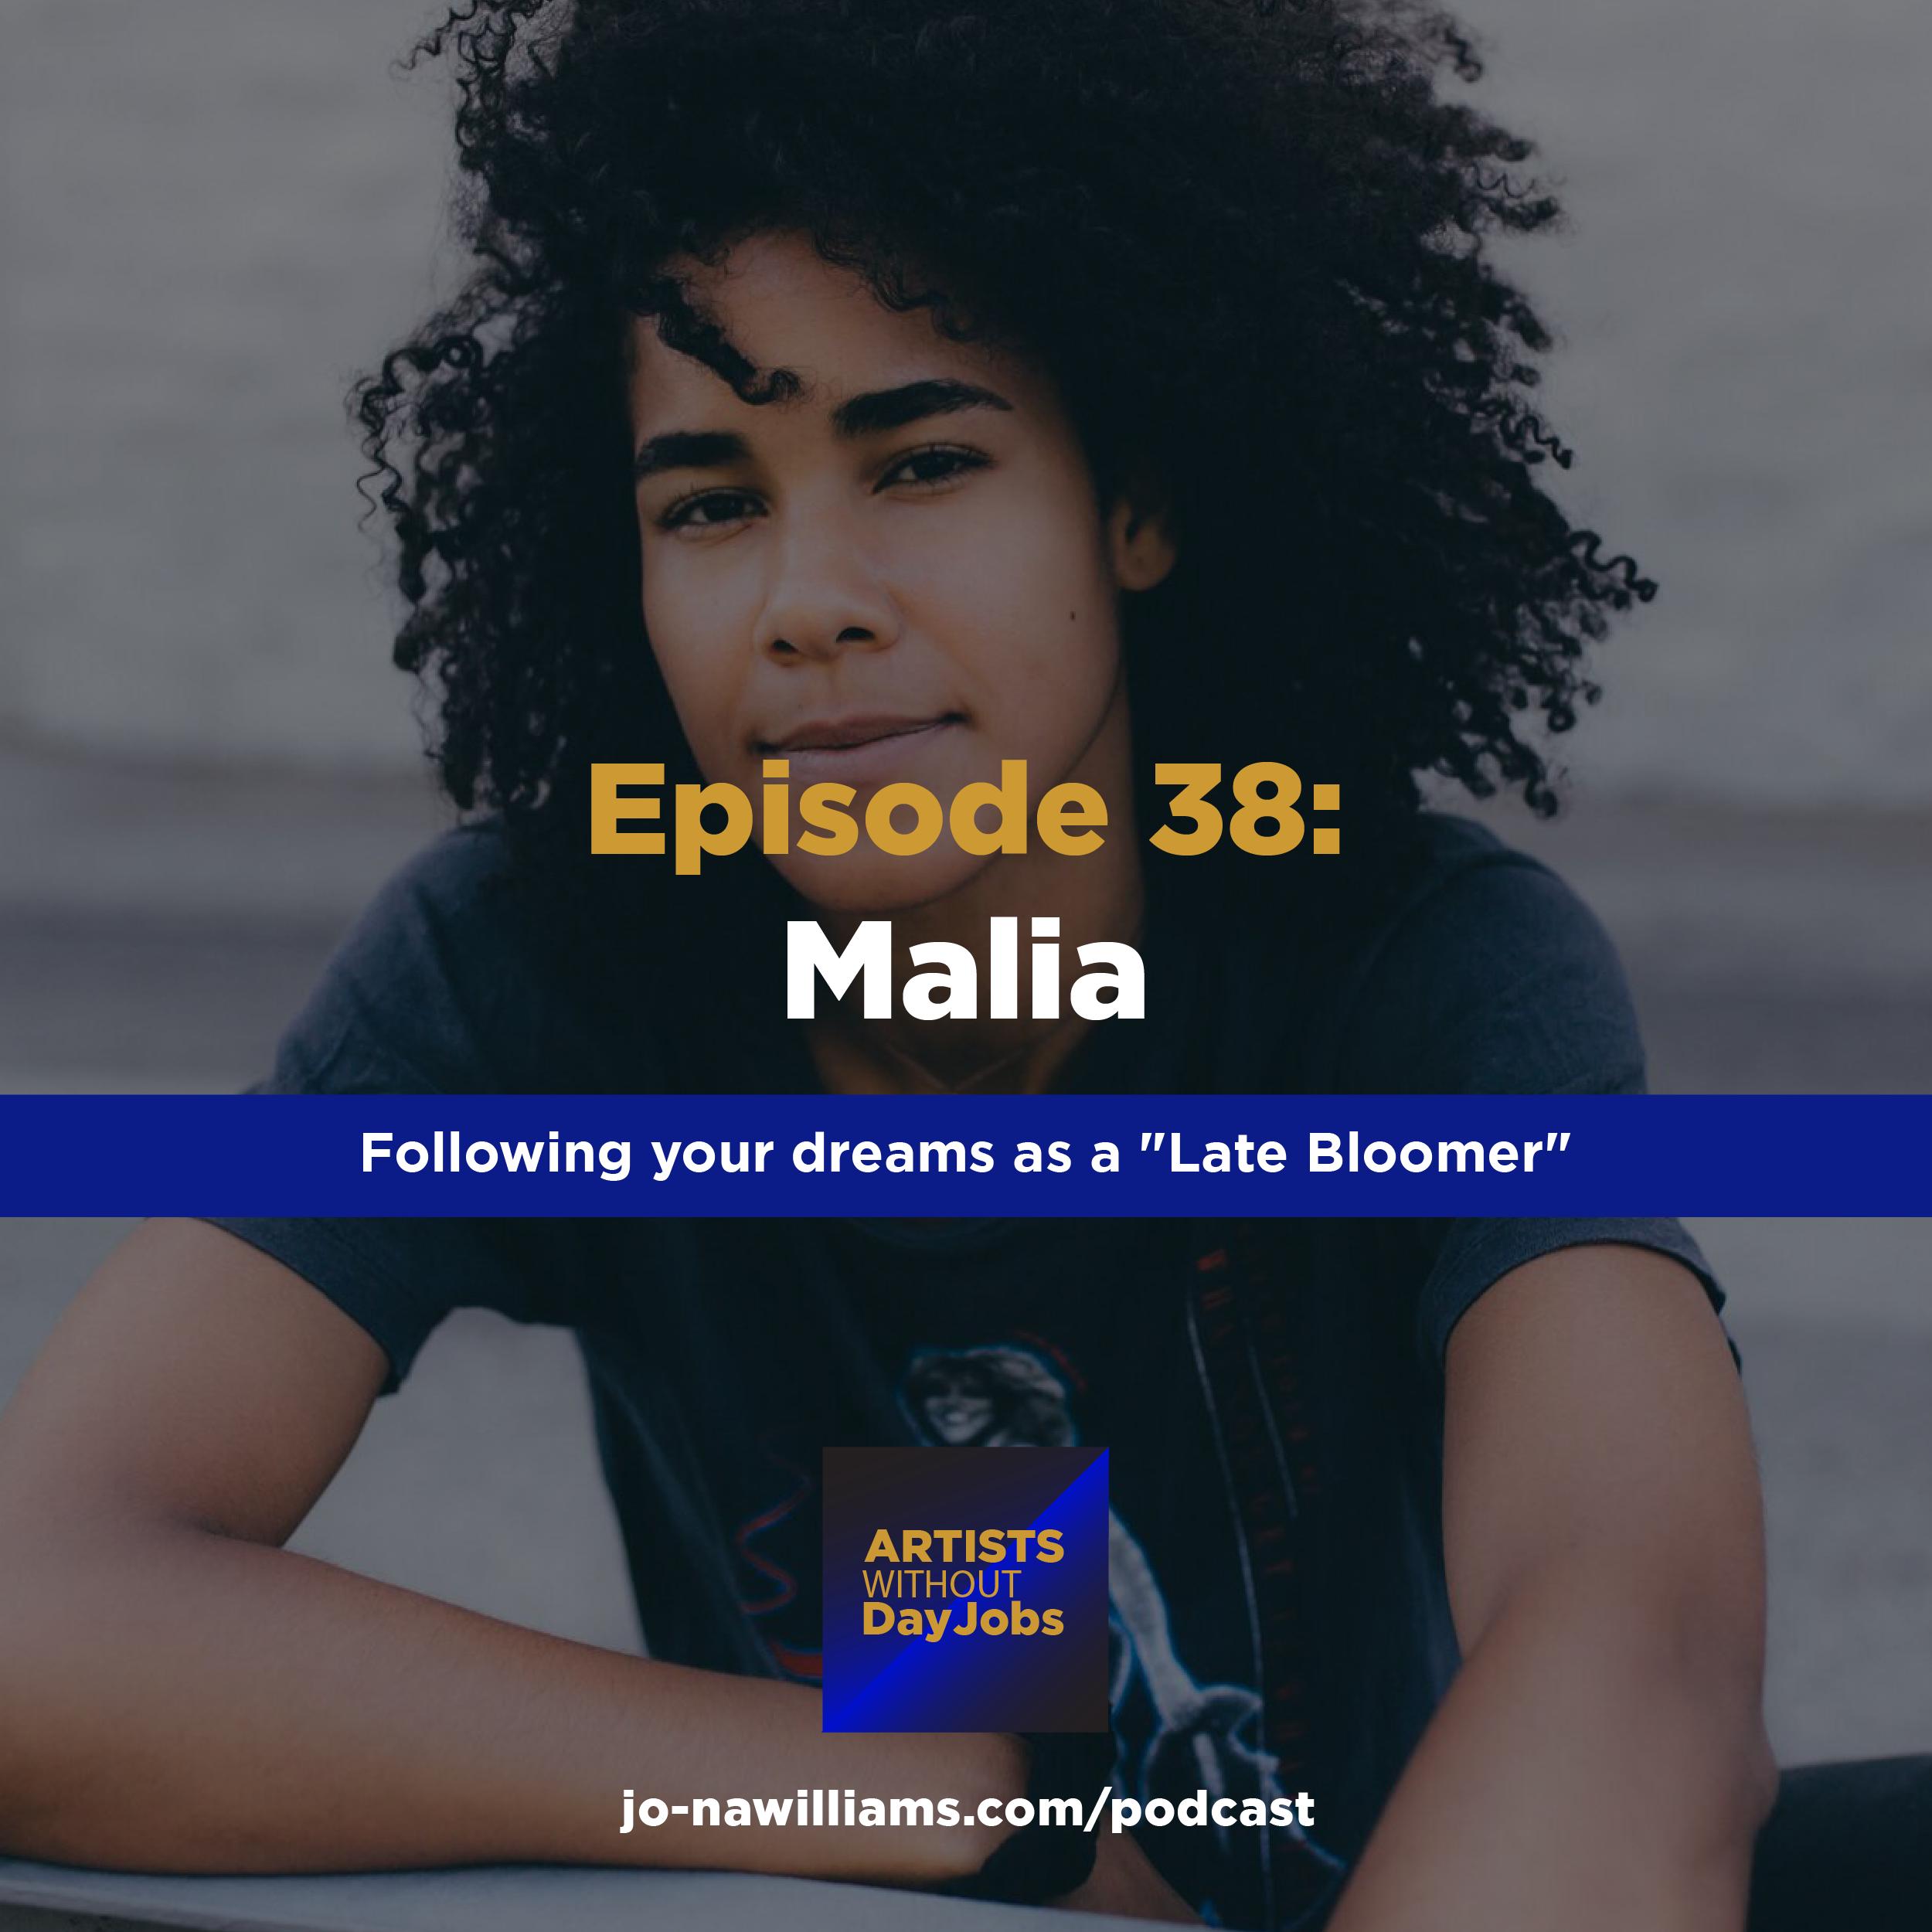 Malia_Episode 38_template-01.png